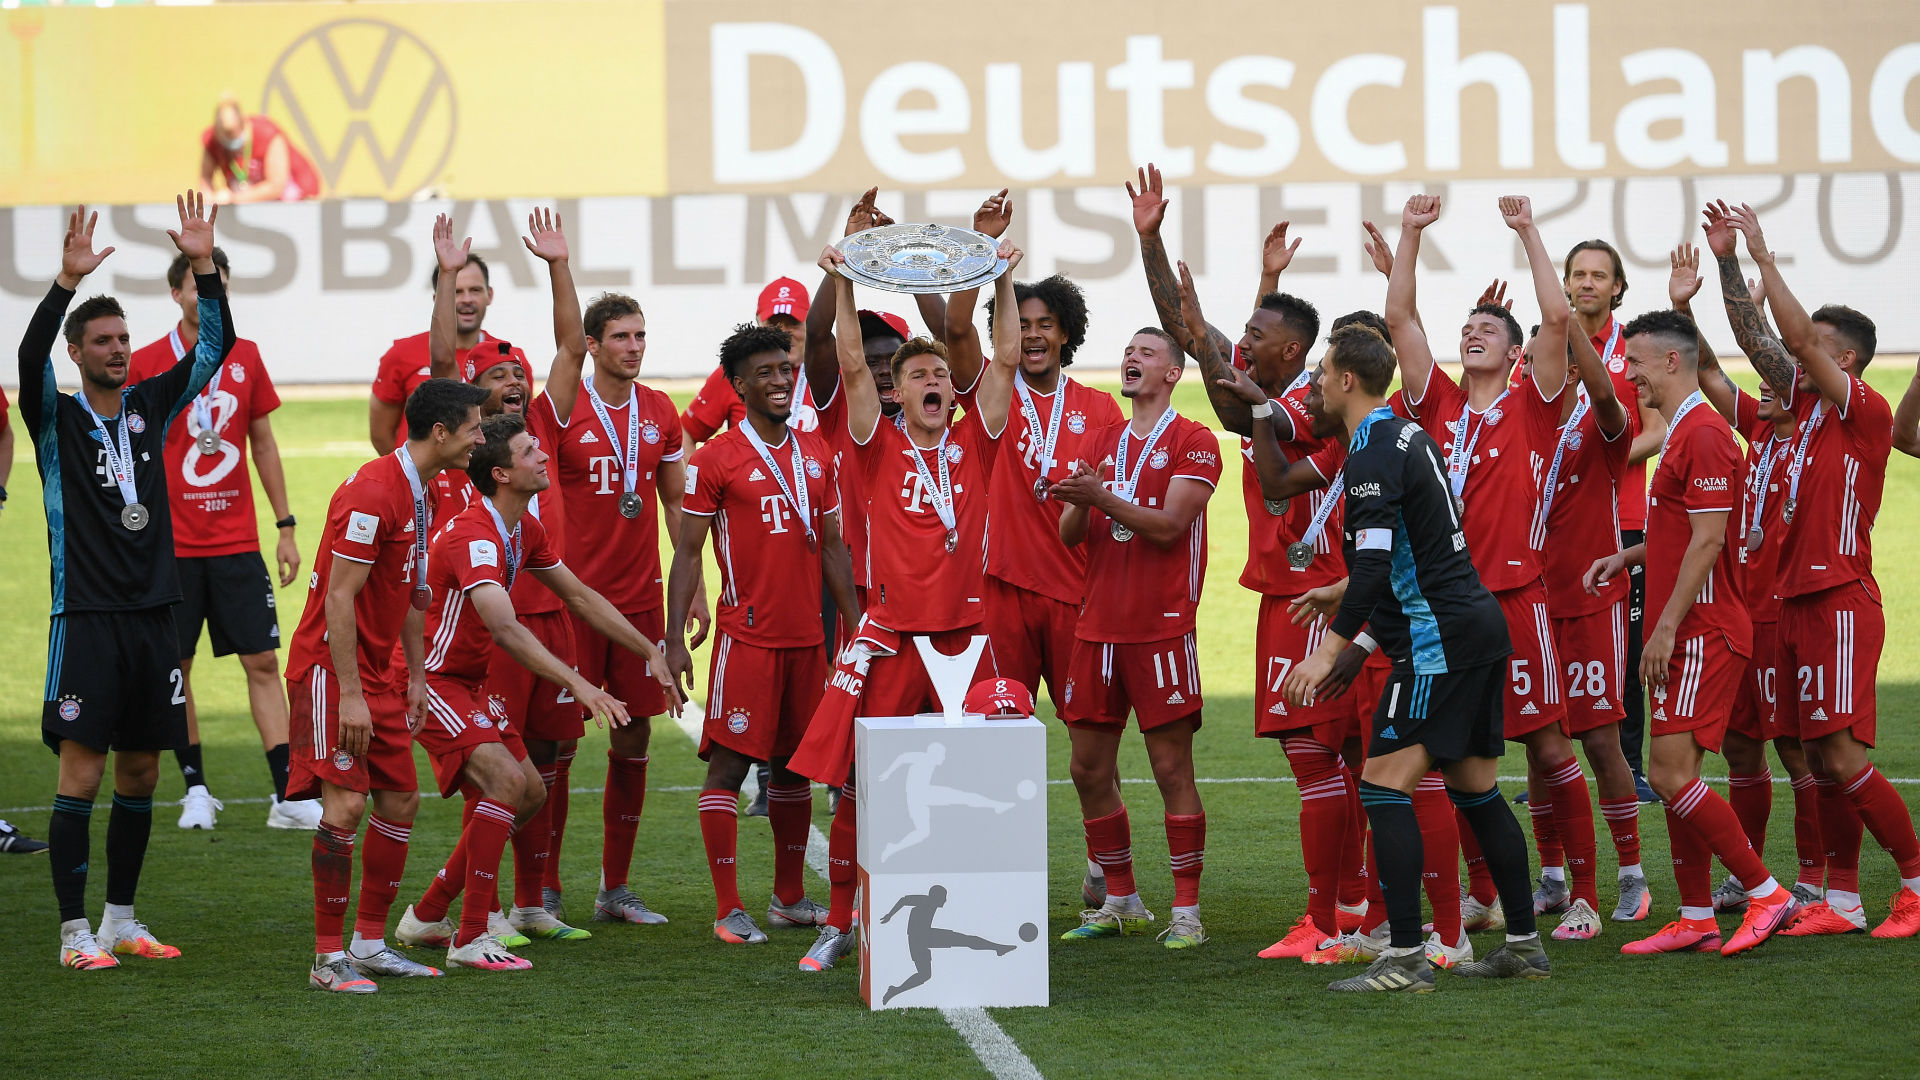 Bundesliga 2020-21 fixtures: Bayern set to face Schalke in opening game